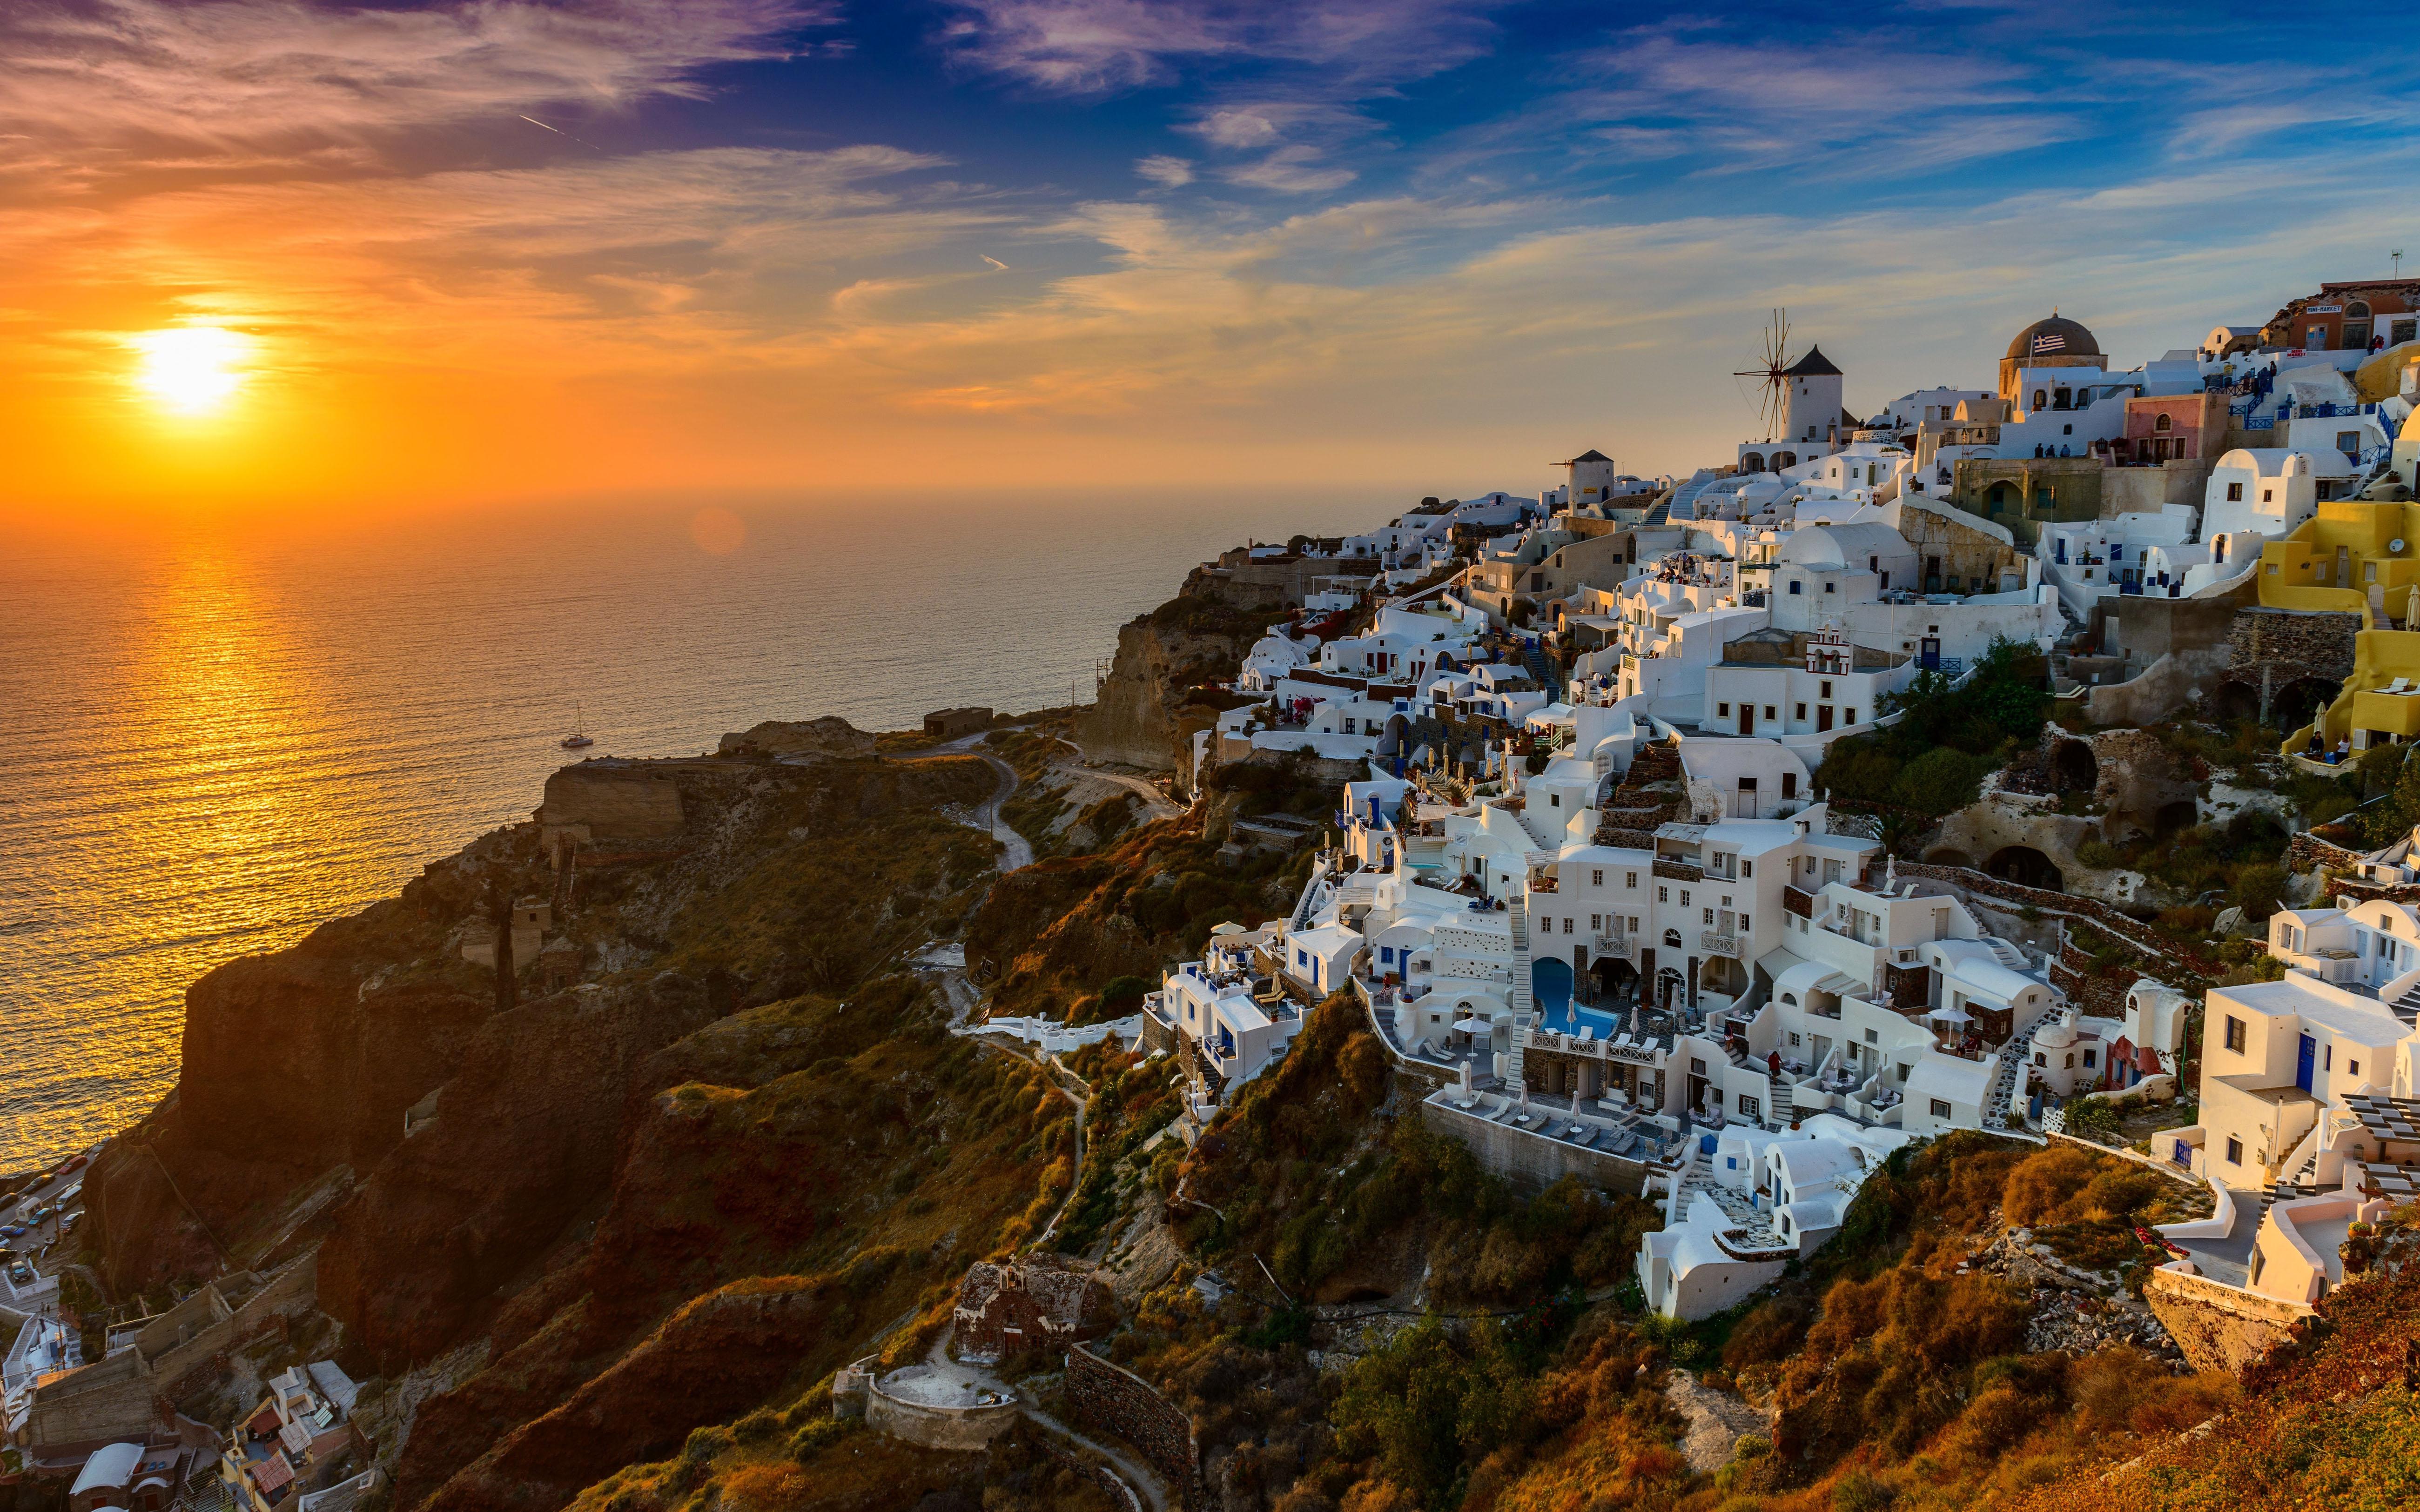 Hd Christmas Wallpaper For Ipad Santorini Island In Greece Aegean Sea Sunset Desktop